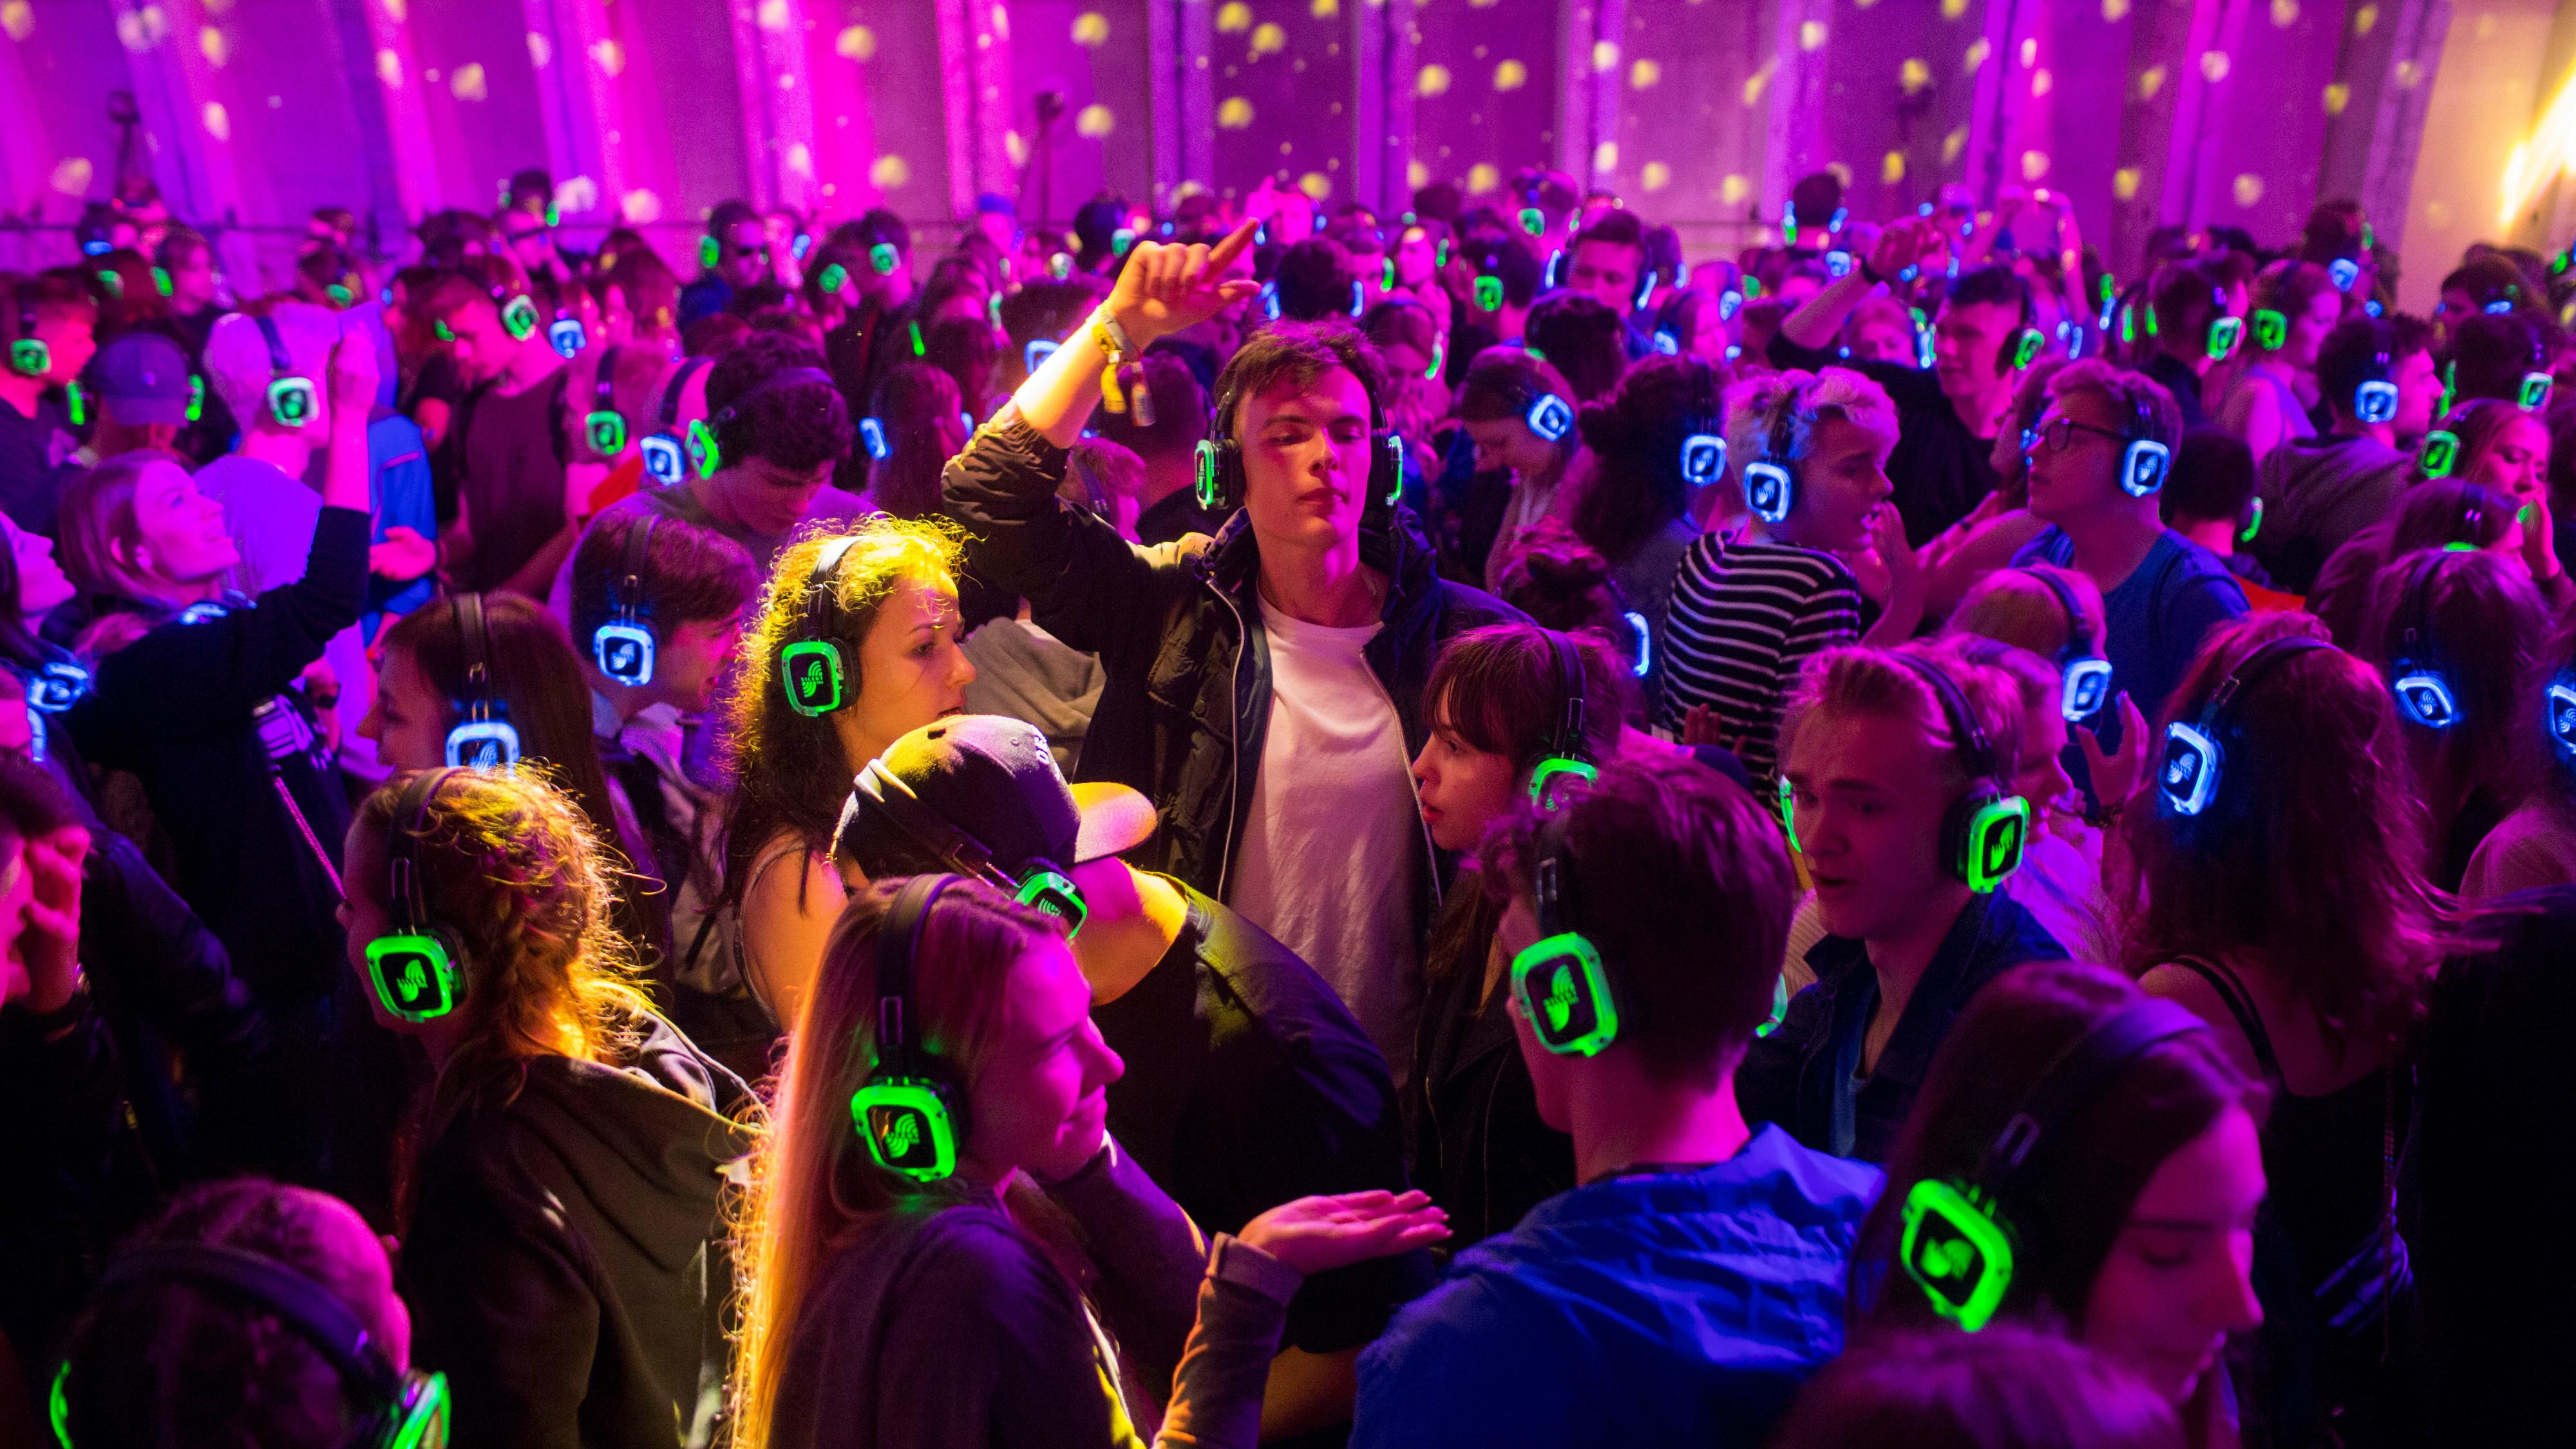 People dancing as part as silent disco